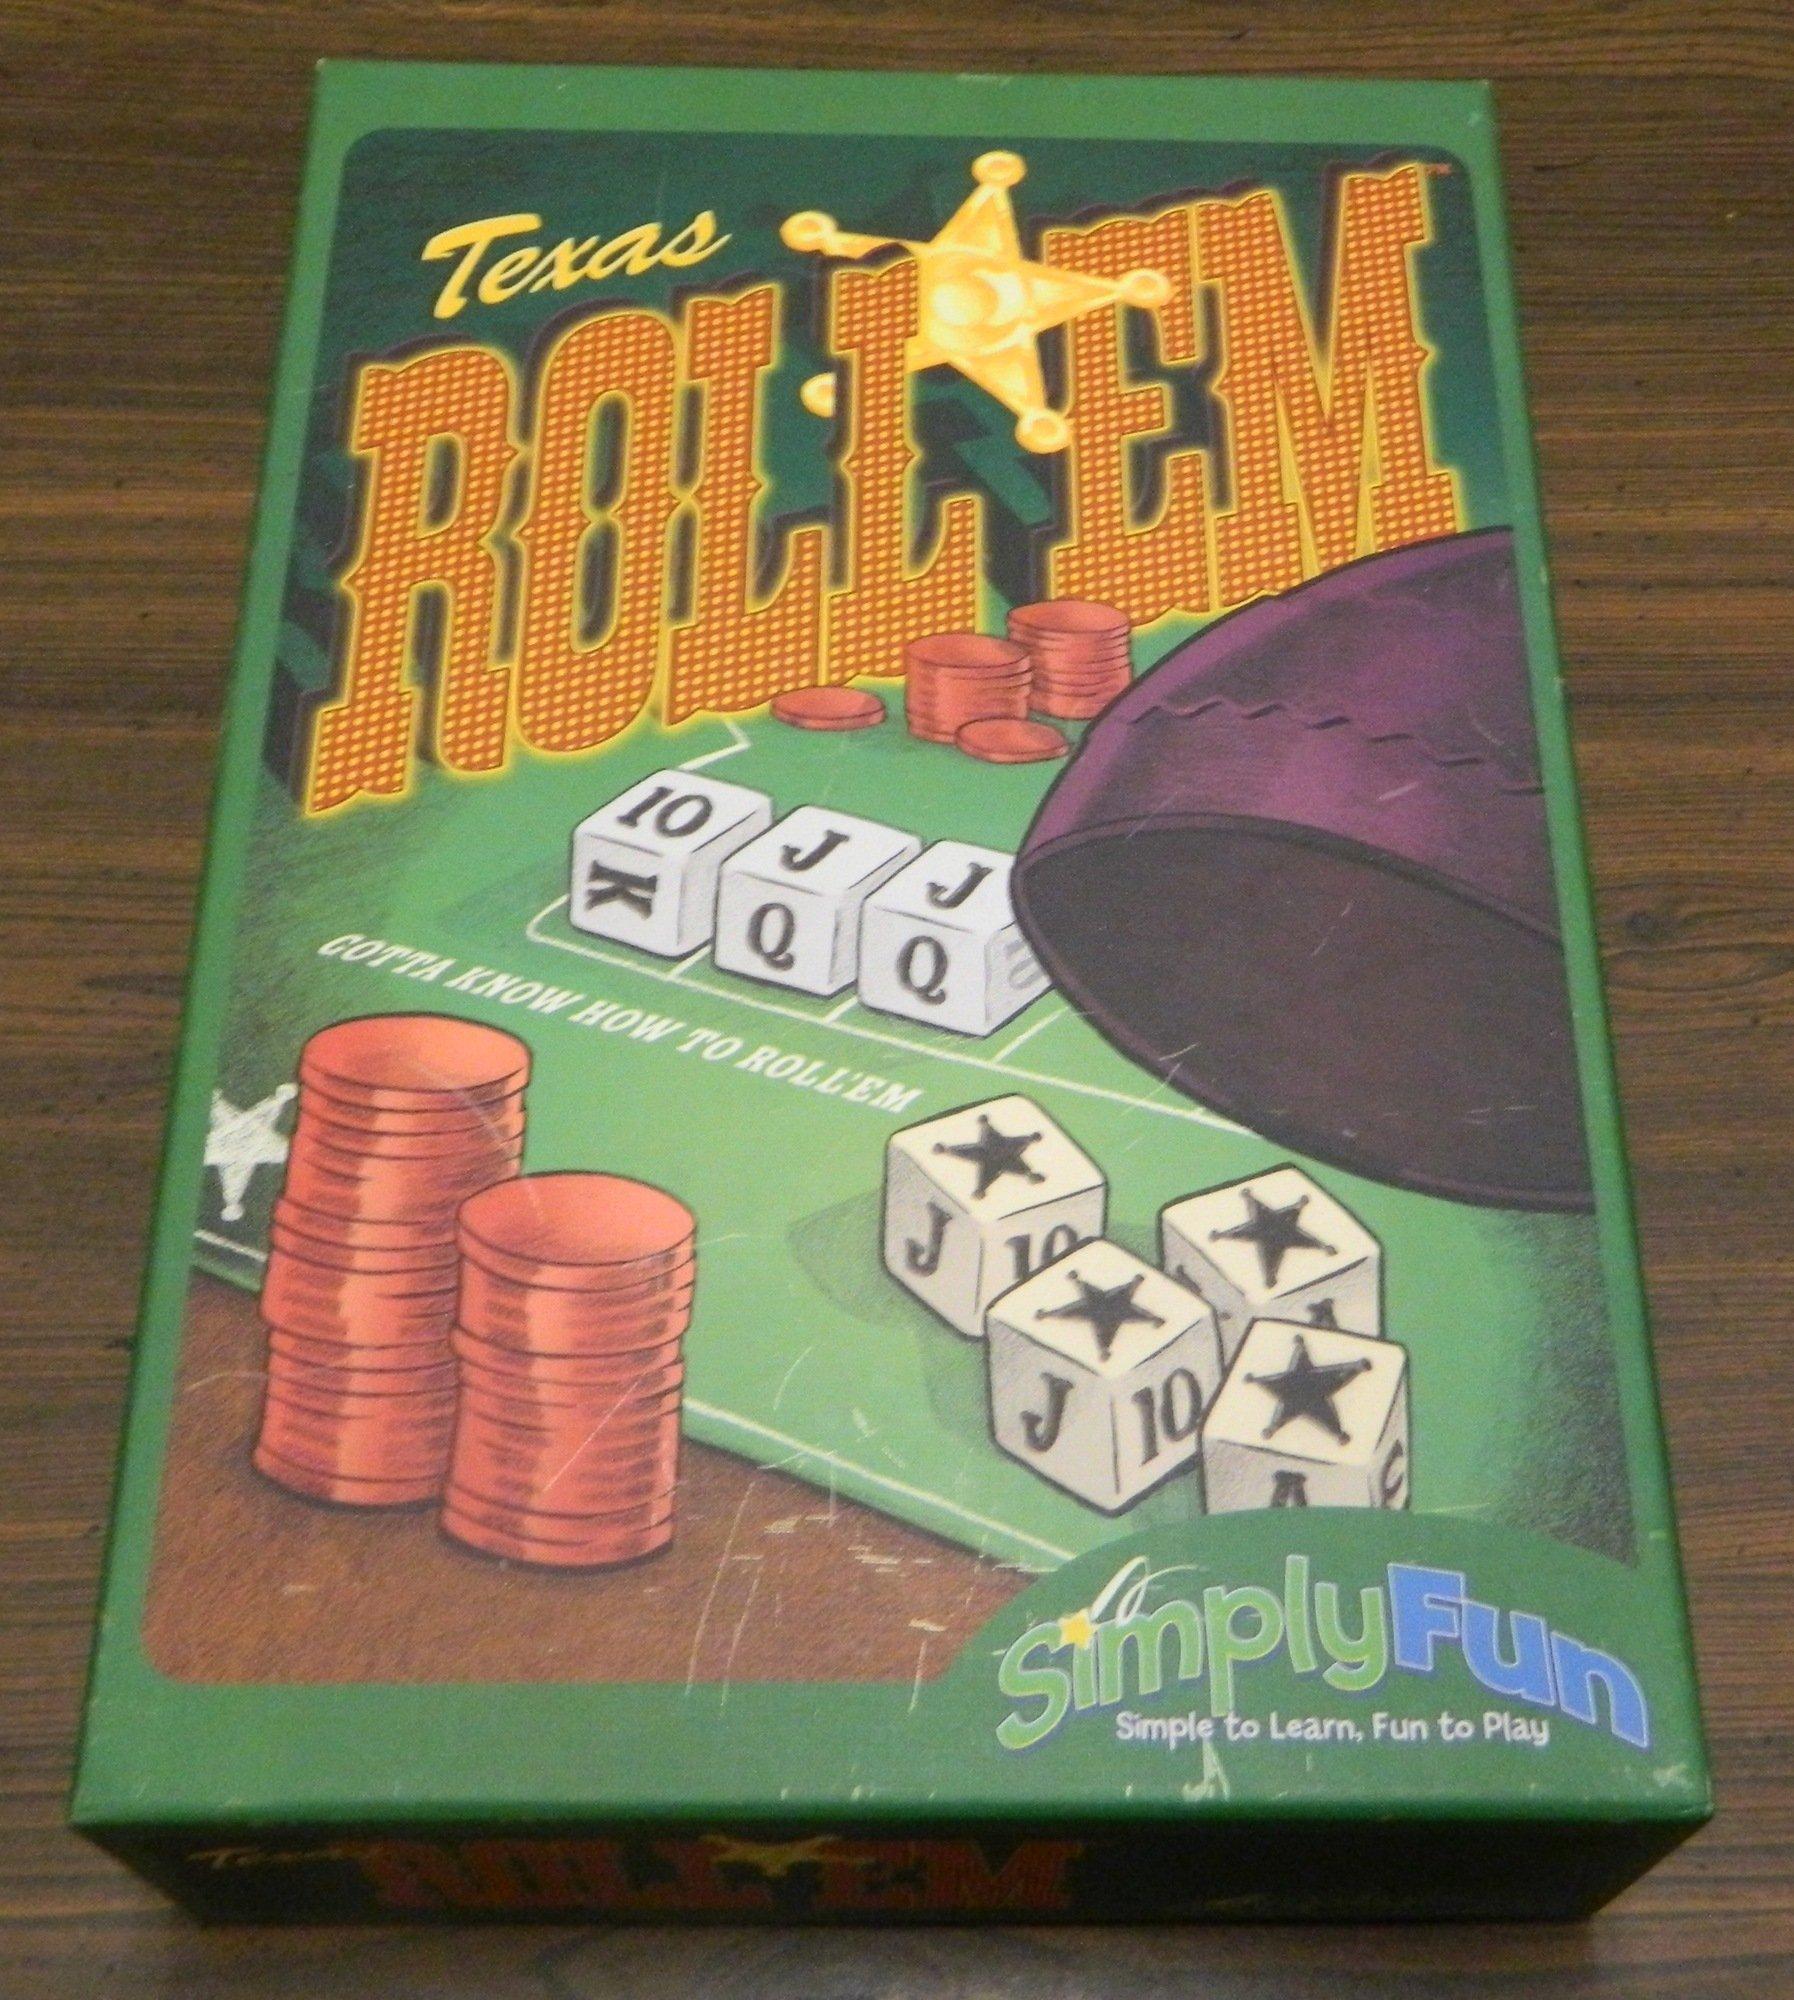 Texas Roll'Em Box